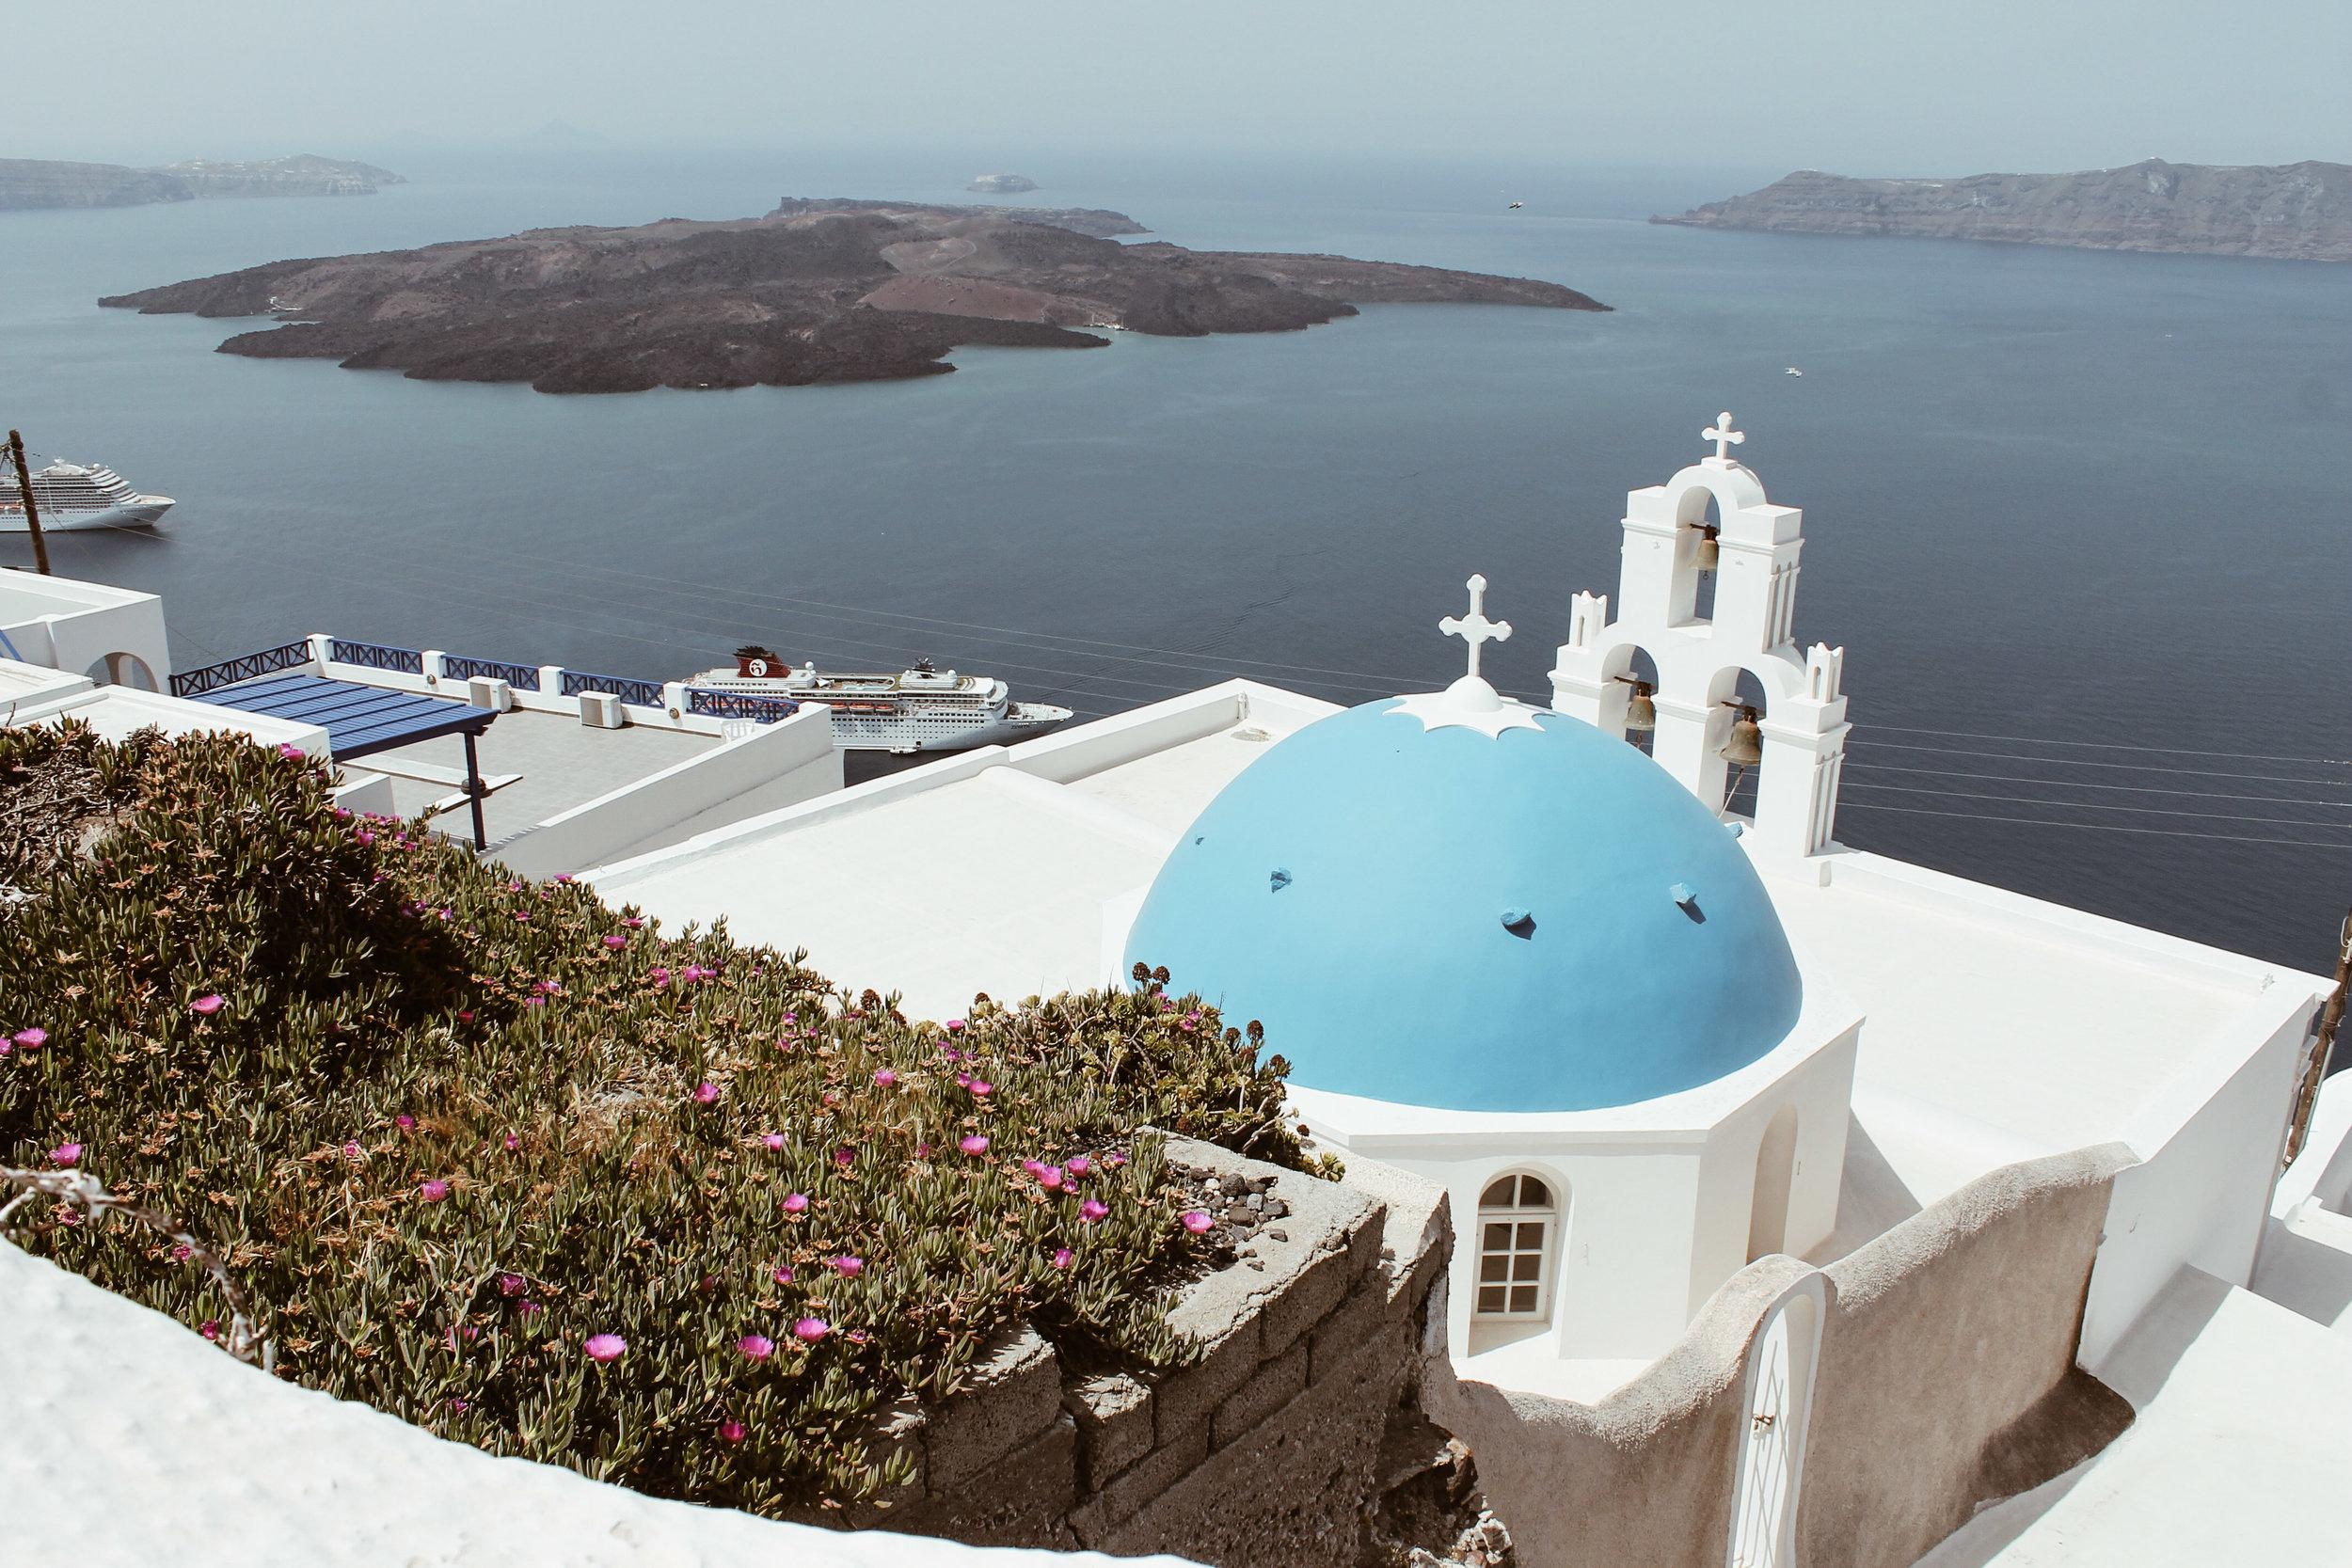 Santorini blue dome roof